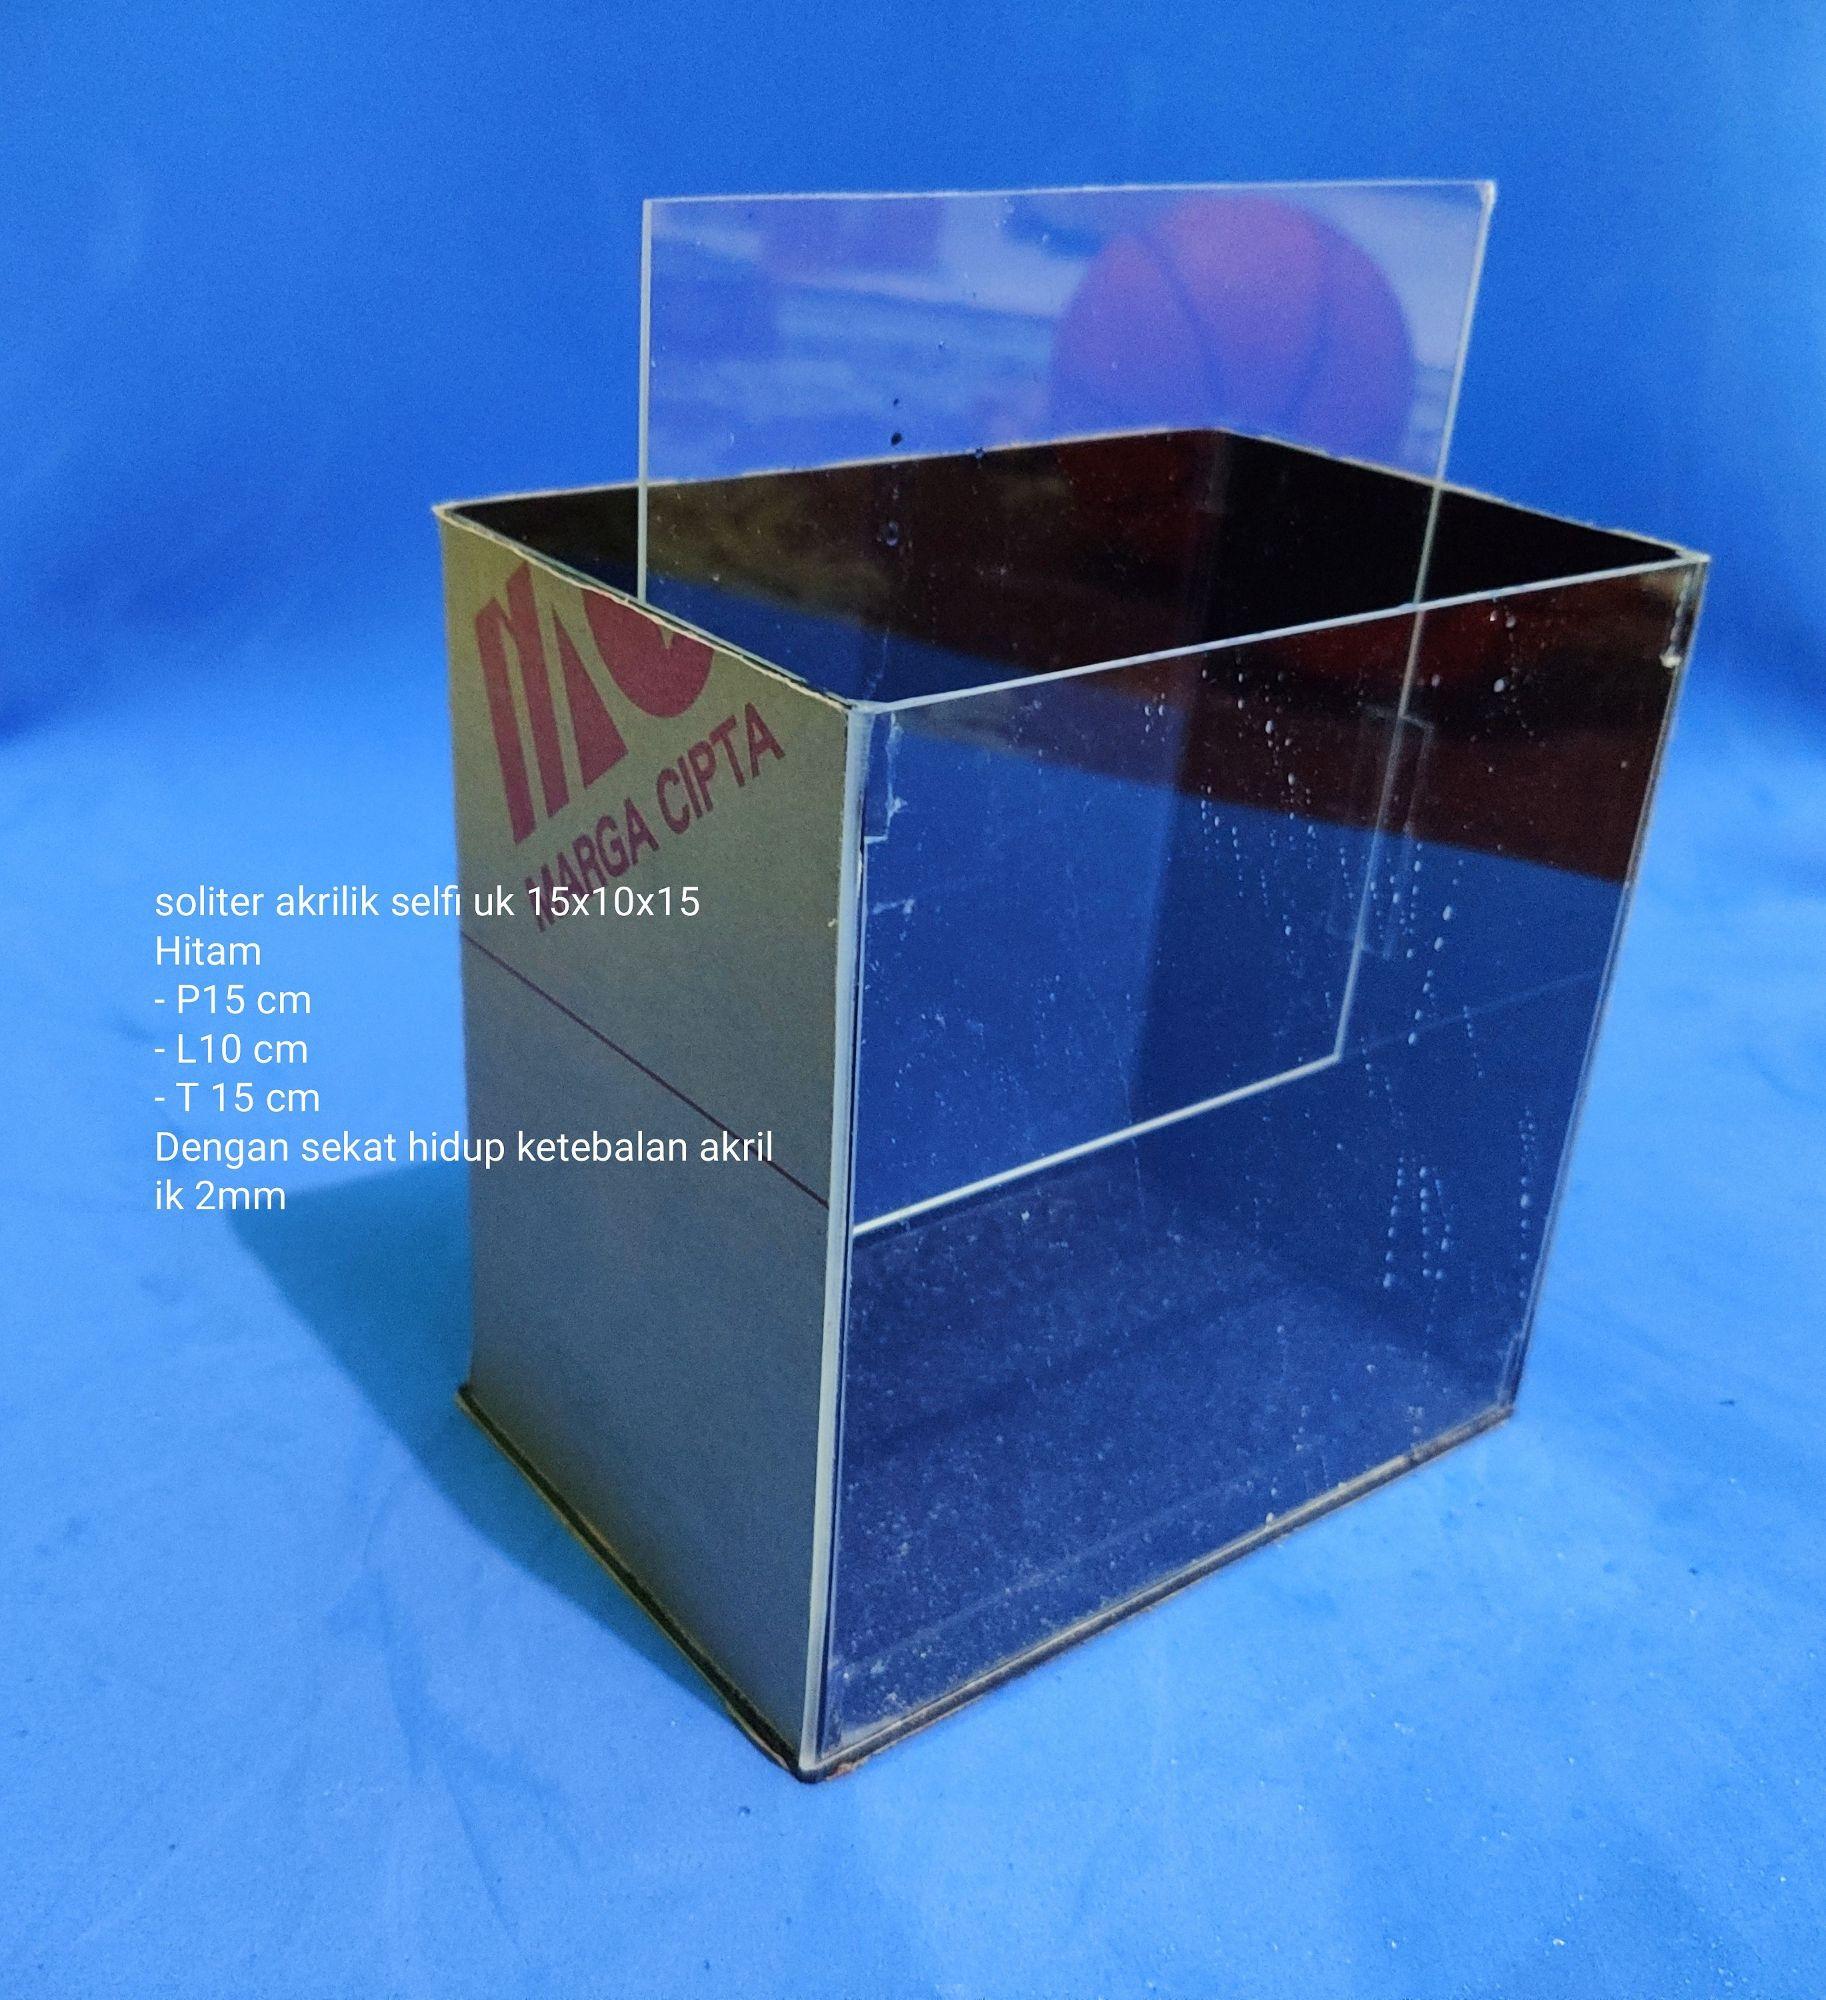 Jual Akuarium Pilihan Varian Terlengkap Lazada Co Id